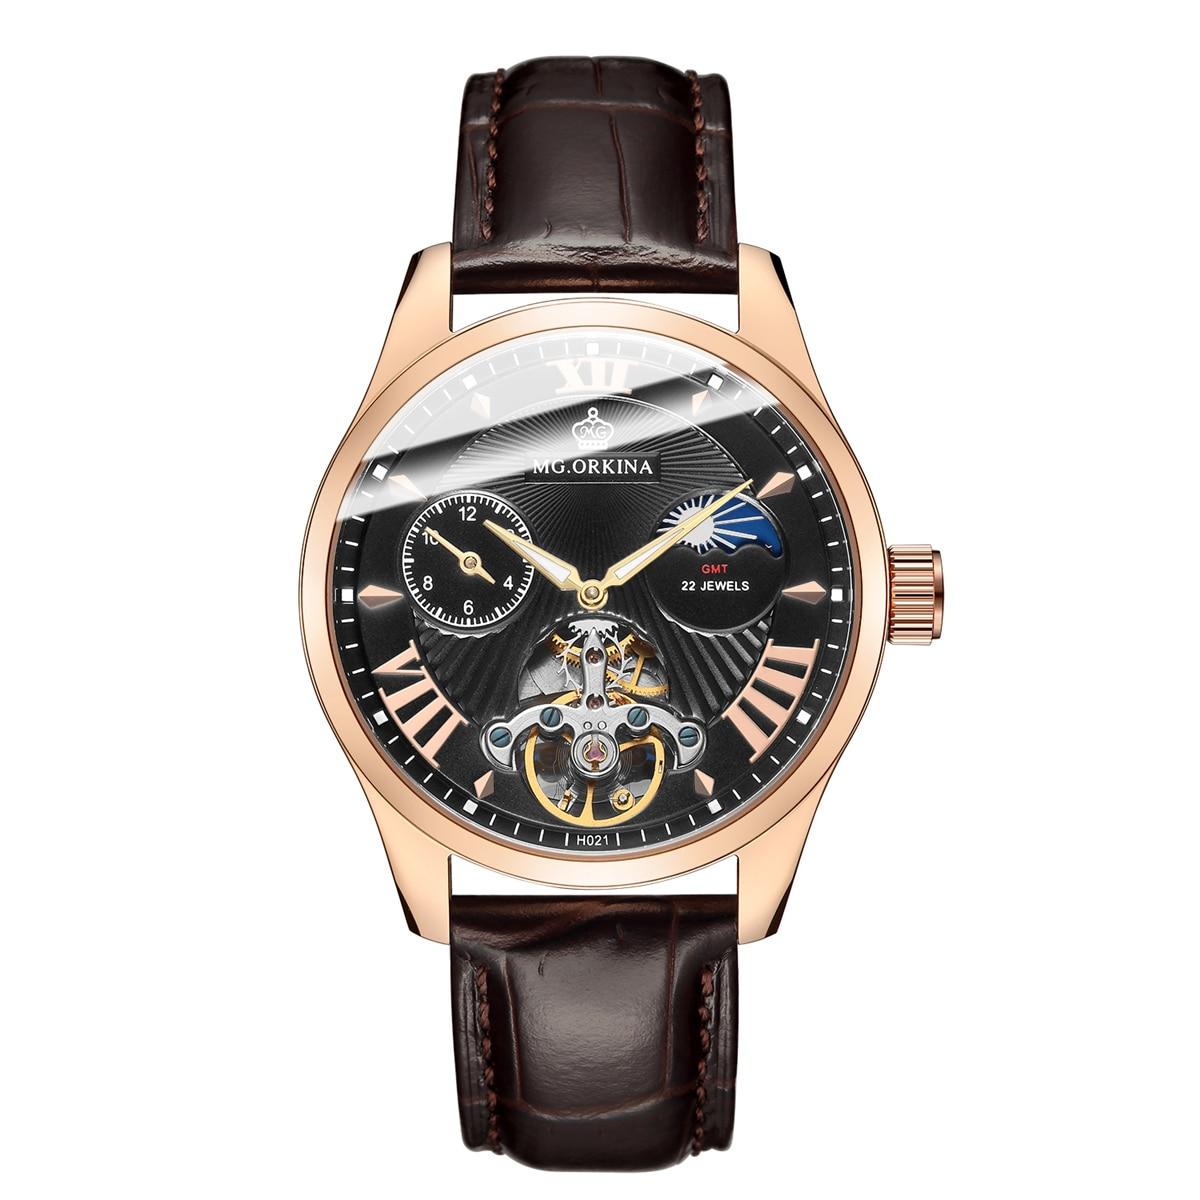 купить ORKINA New Men Full-Automatic Mechanical Watch Tourbillon Luxury Fashion Brand Genuine Leather Man Multifunctional Watches по цене 3399.2 рублей